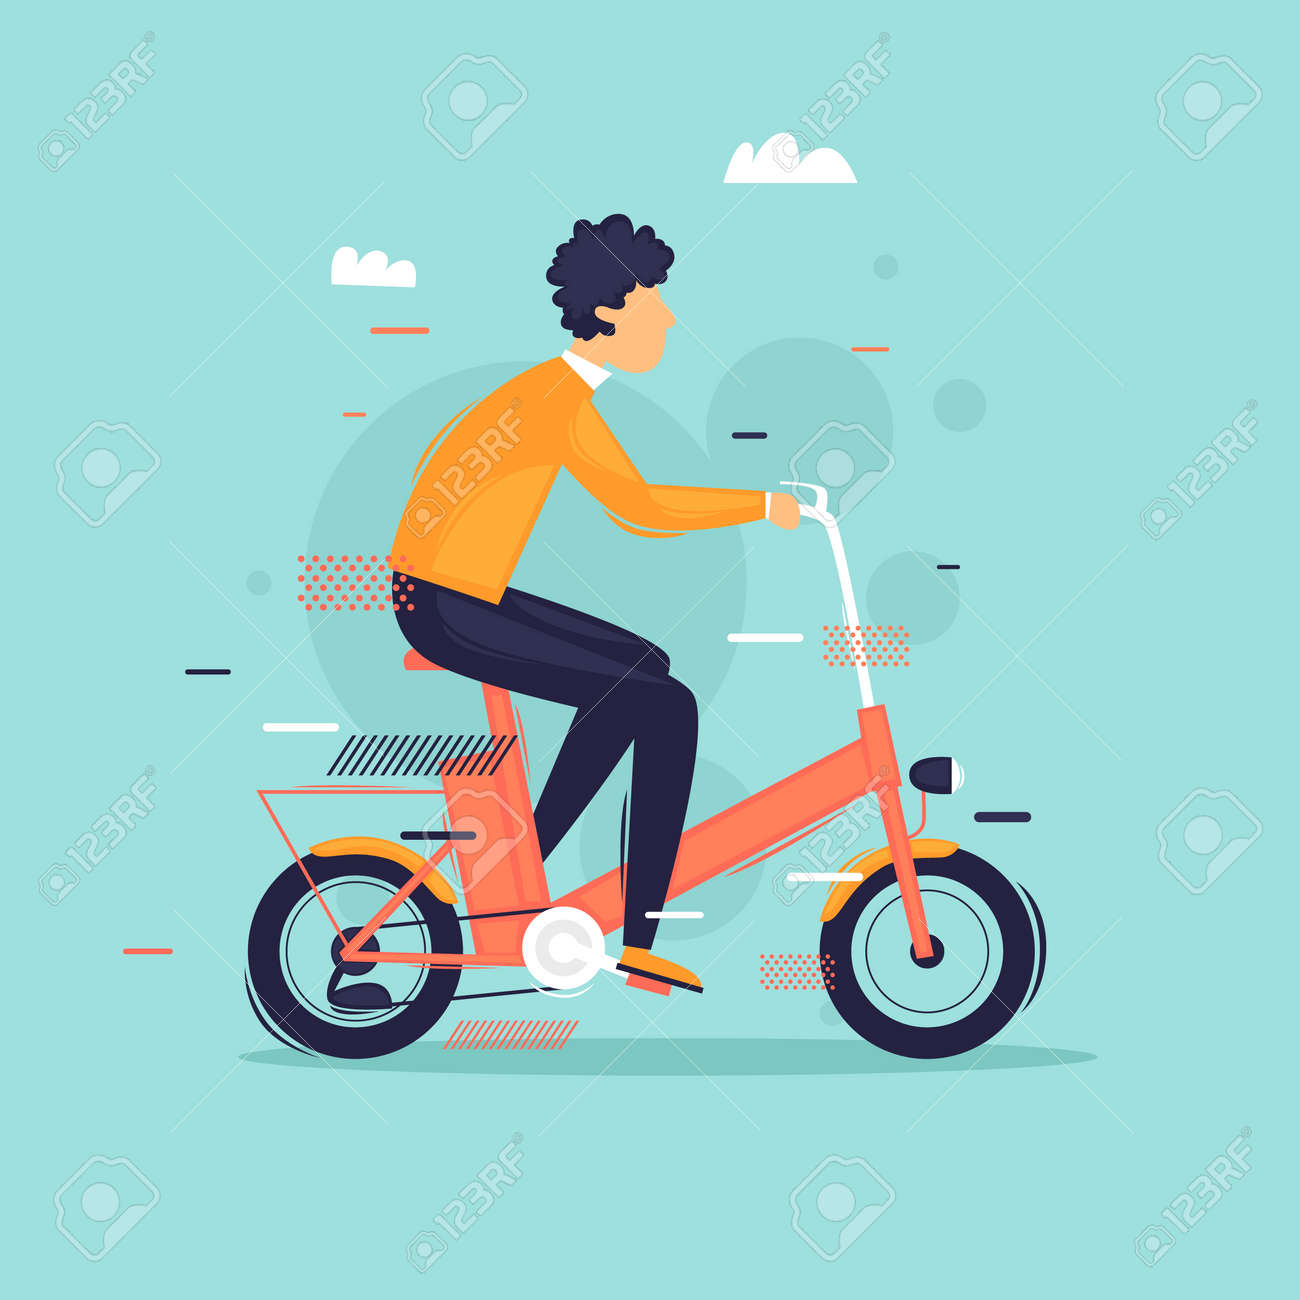 Man riding an electric bike. Flat design vector illustration. - 120569937